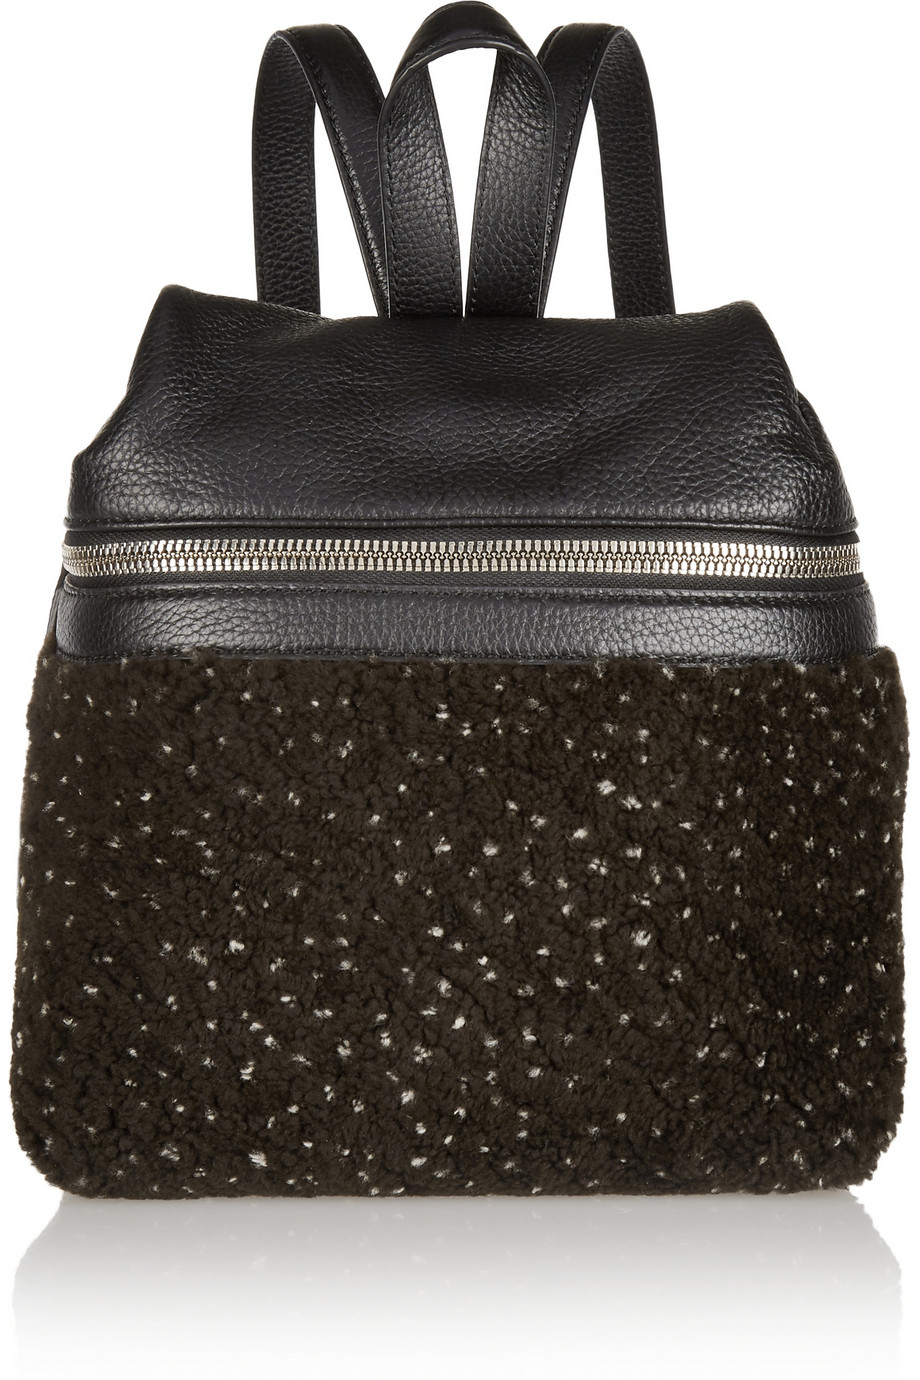 Вещь дня: рюкзак KARA-320x180